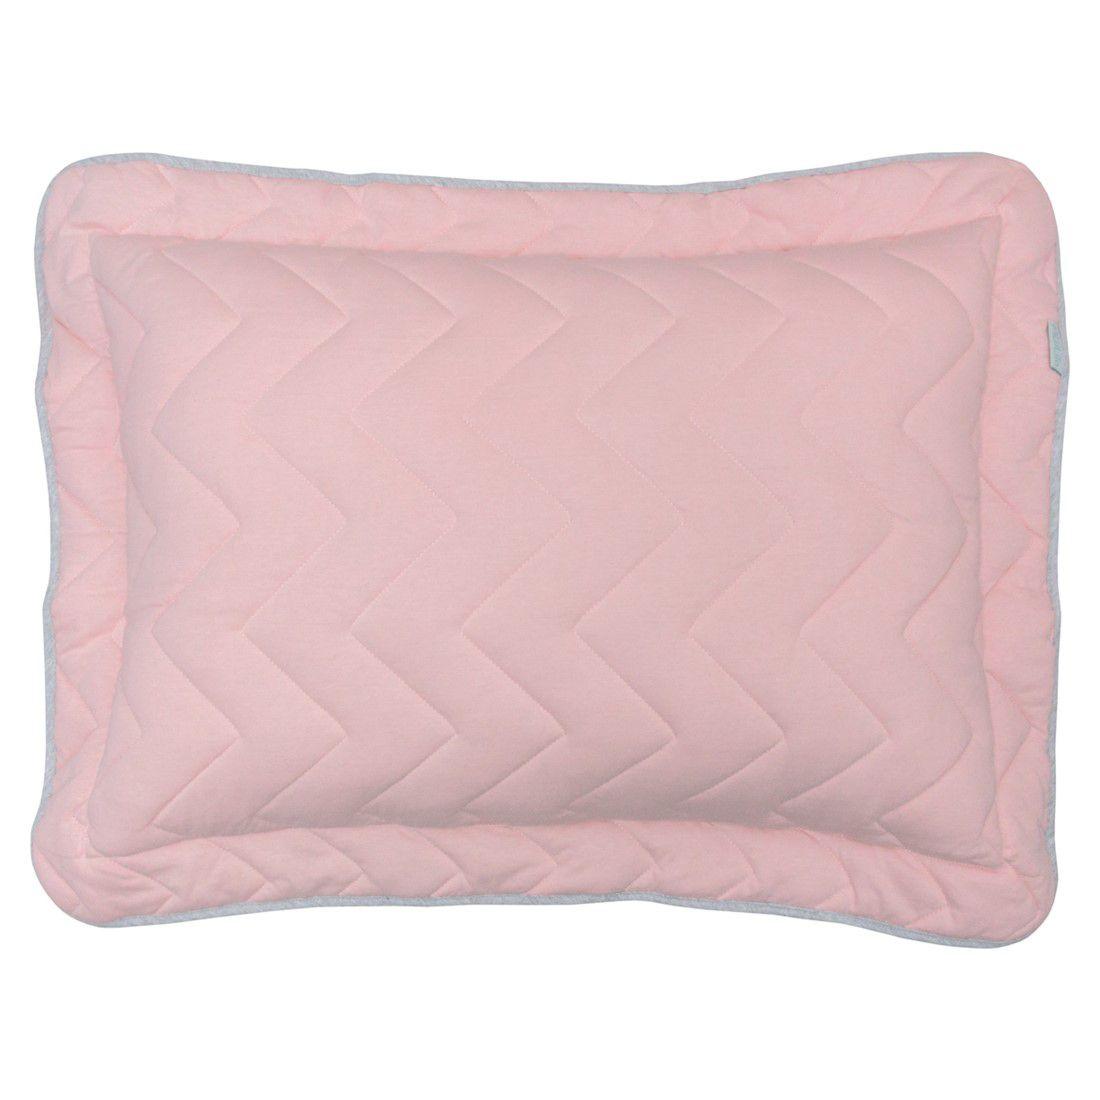 Porta travesseiro em malha chevron 70x50cm rosa chá